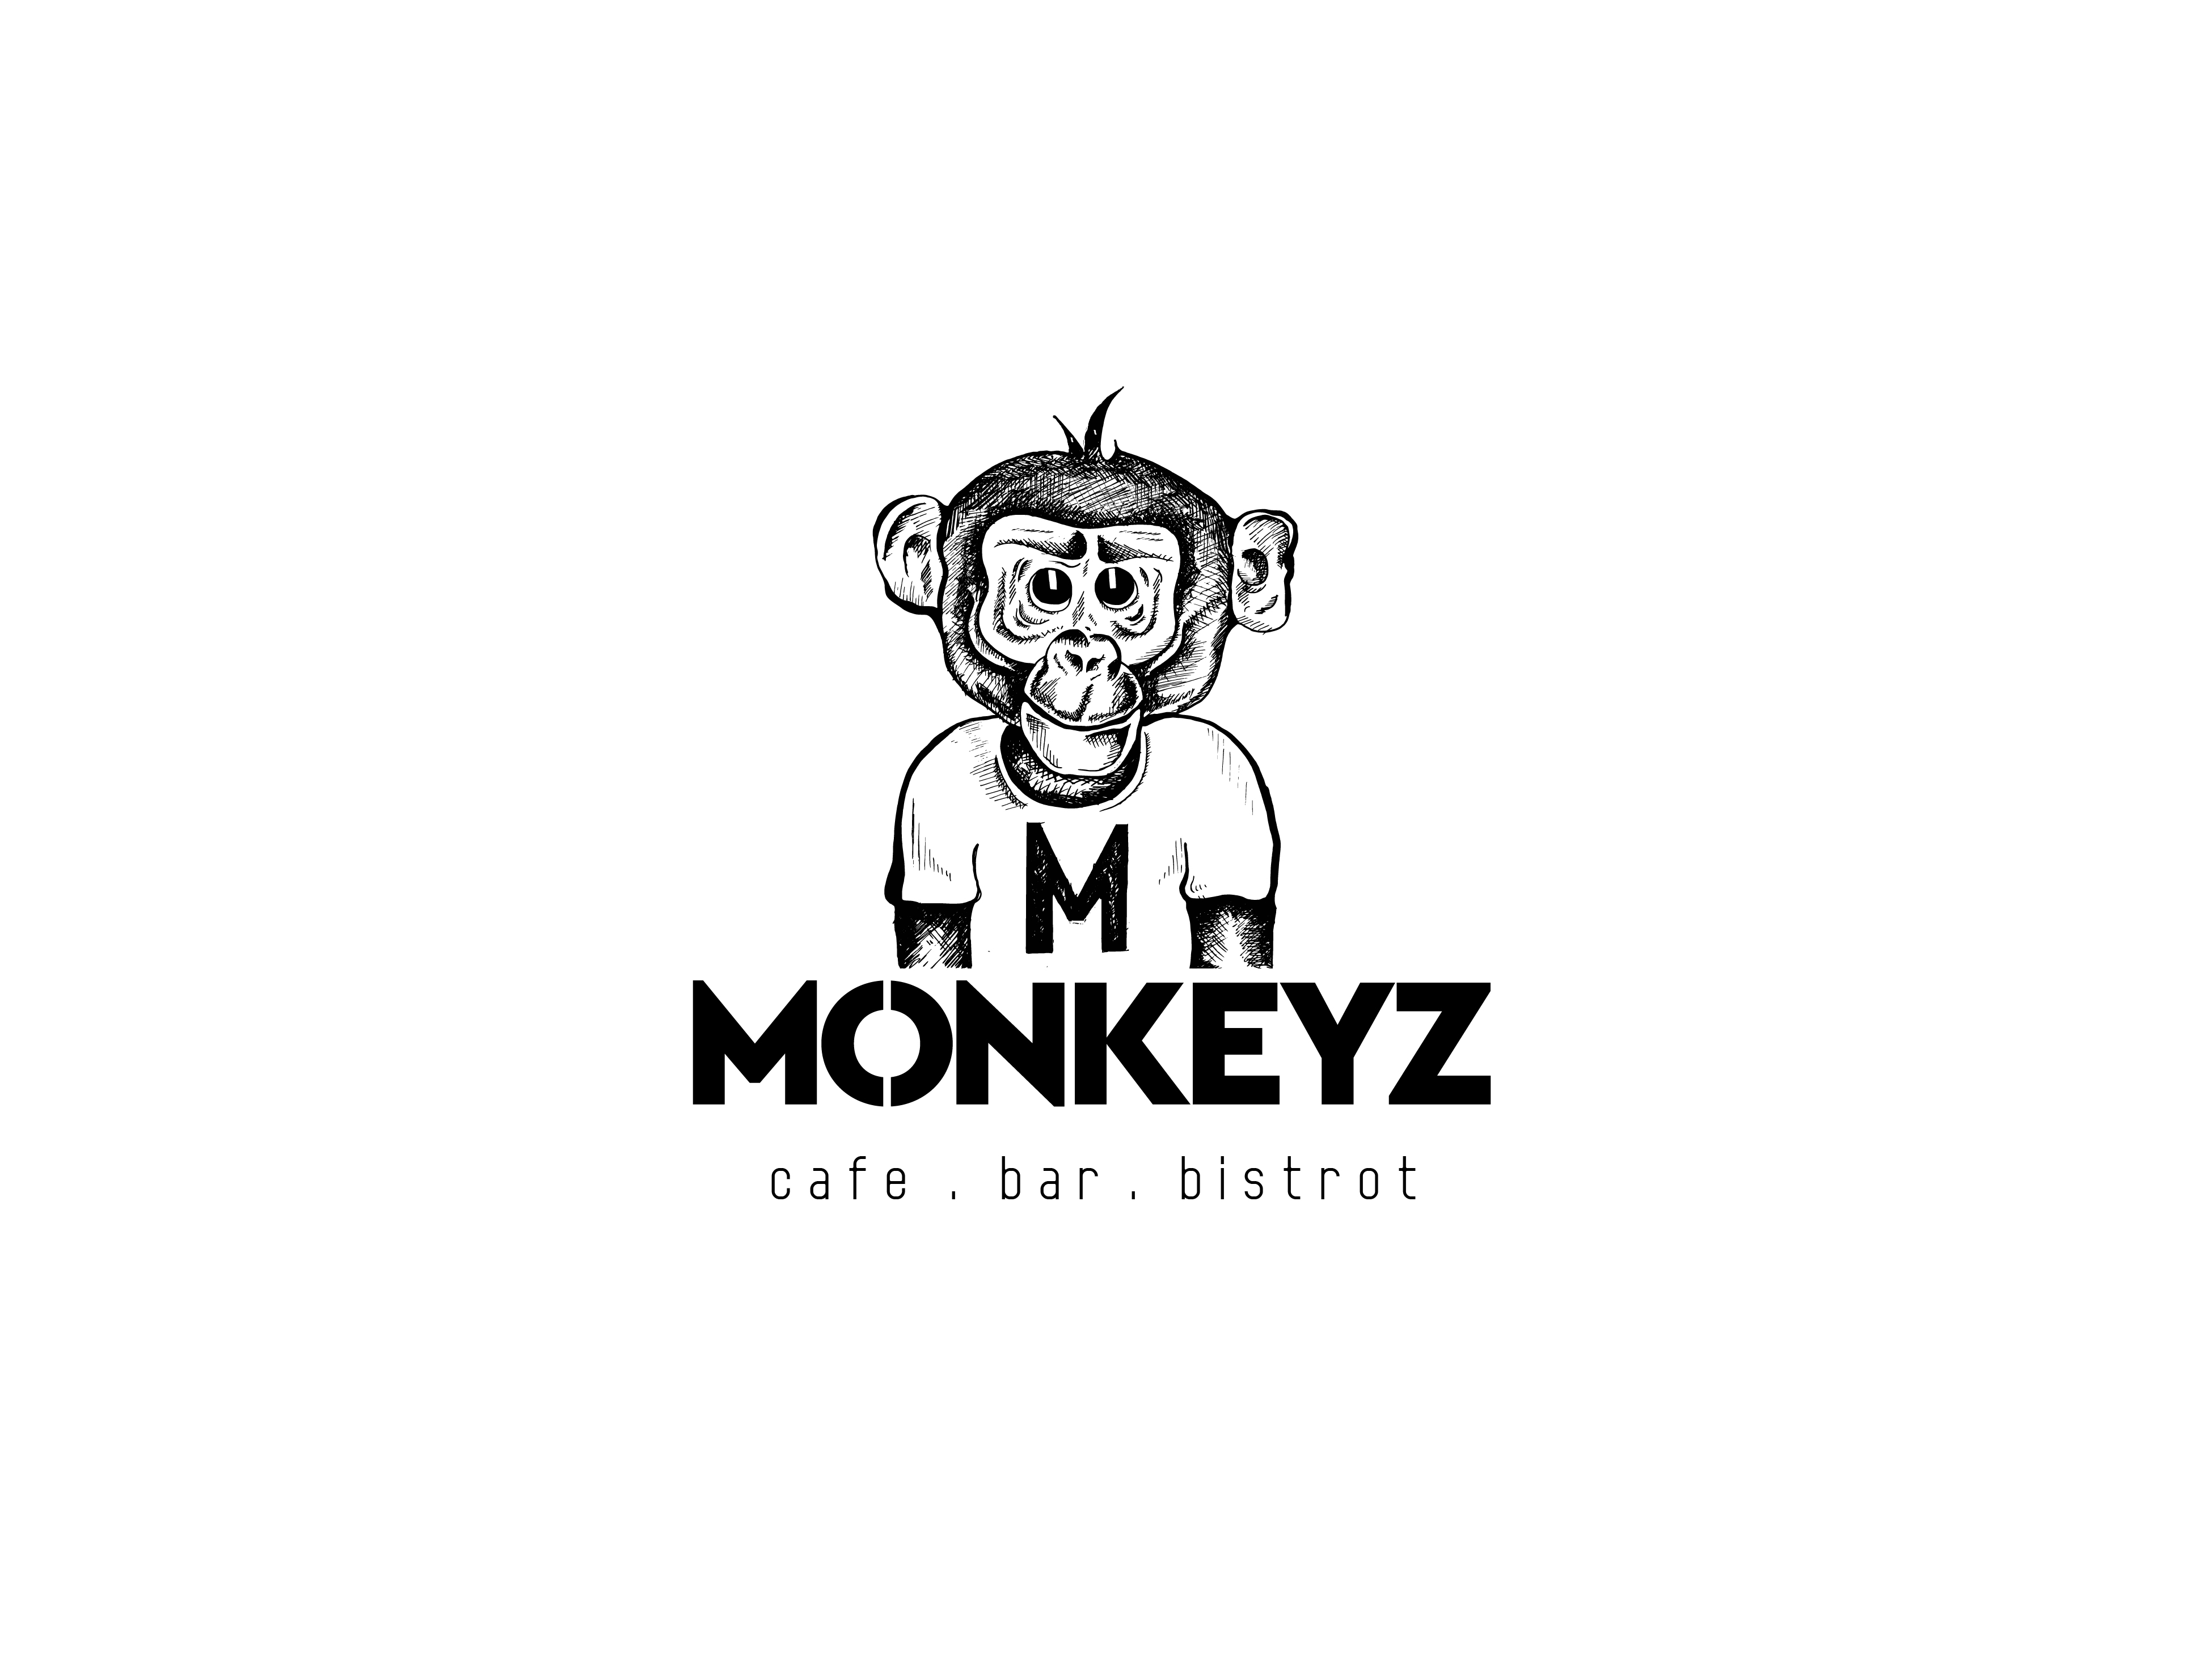 MONKEYZ logo